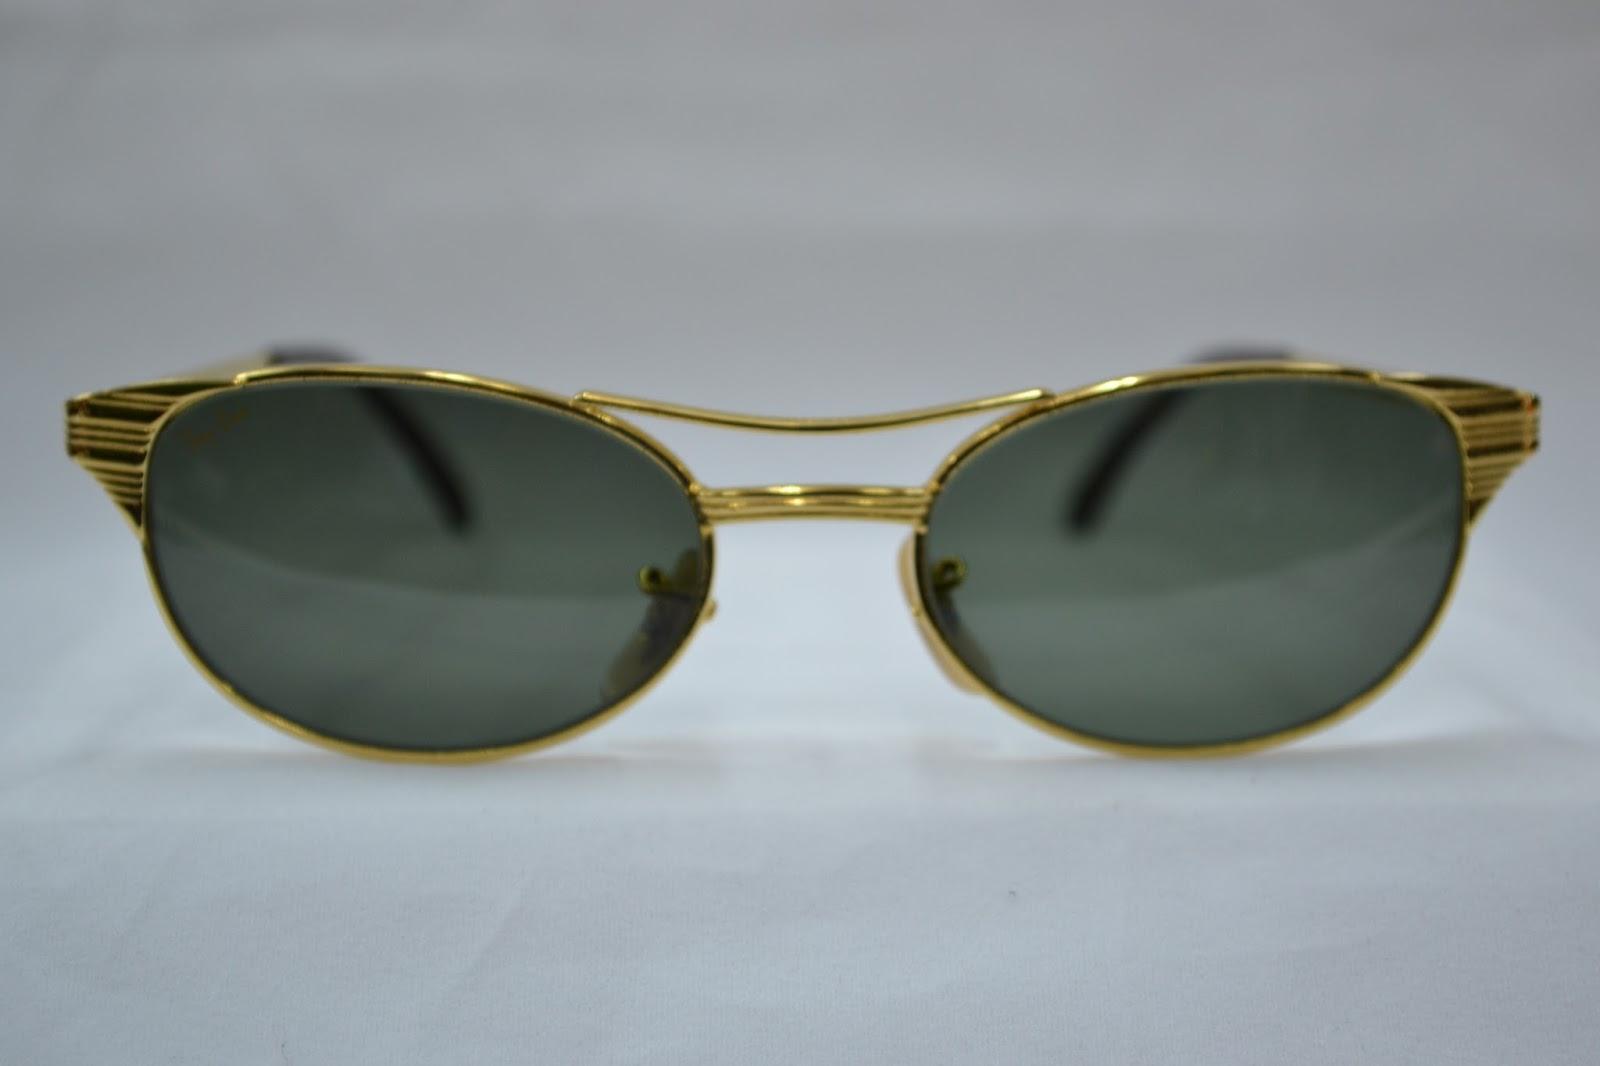 7aa227956a9 Vintage sunglass  Vintage Ray Ban USA oval SIGNET sunglass NOS